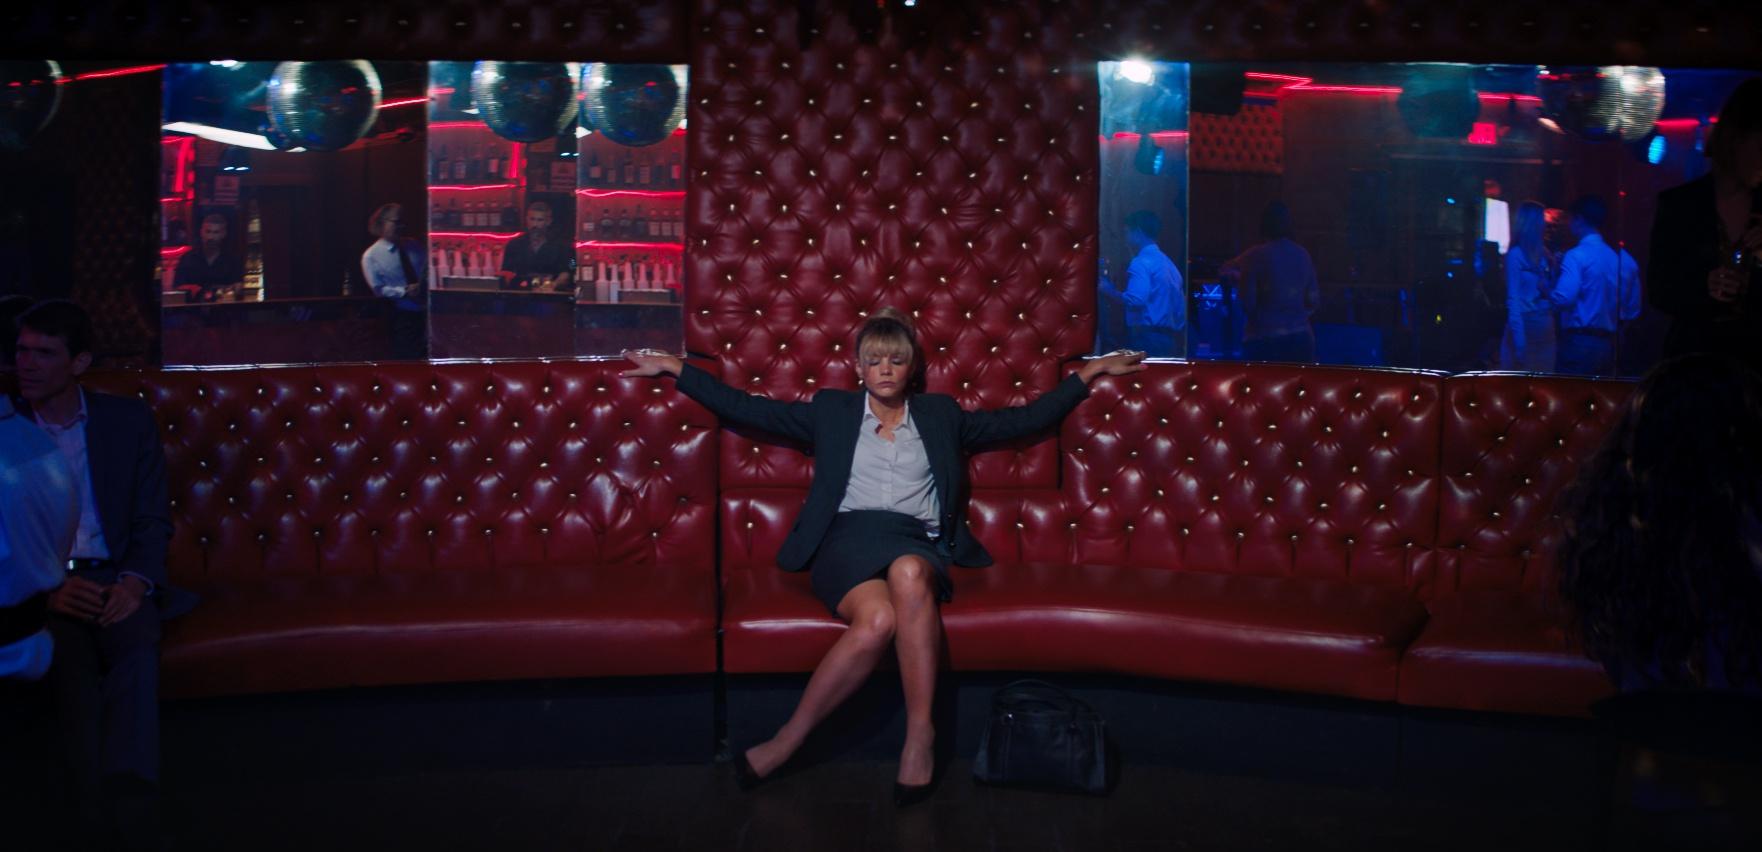 'Minari,' 'Yalda, a Night for Forgiveness' Win Honors at 2020 Sundance Film Festival